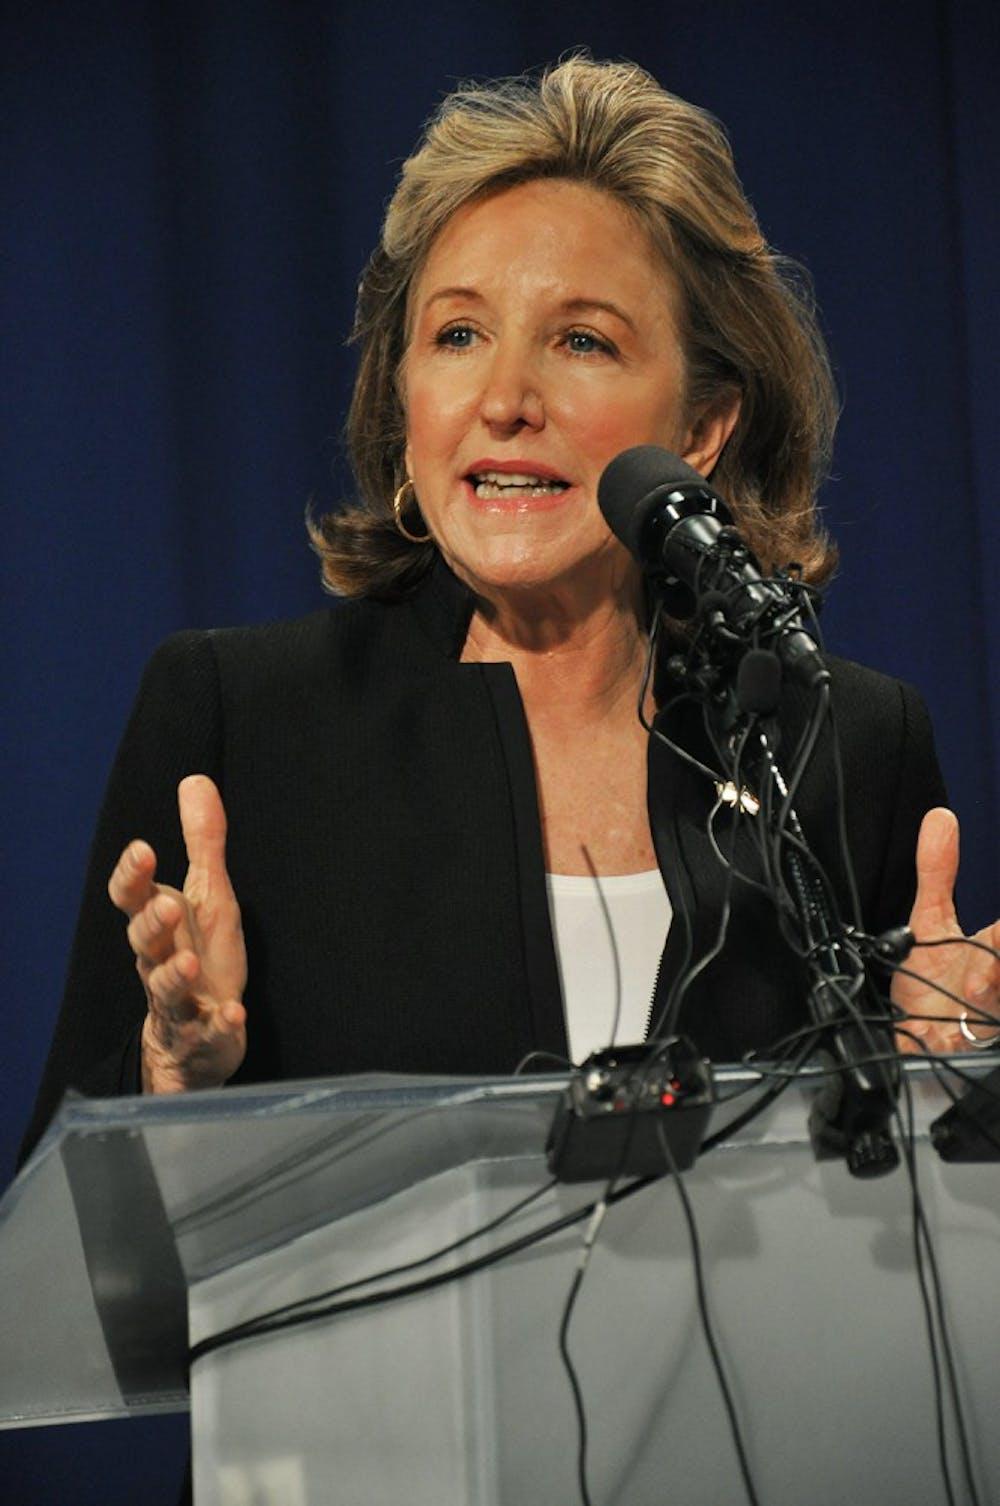 <p>Sen. Kay Hagan, D-N.C. and opponent Thom Tillis debated on Tuesday.</p>